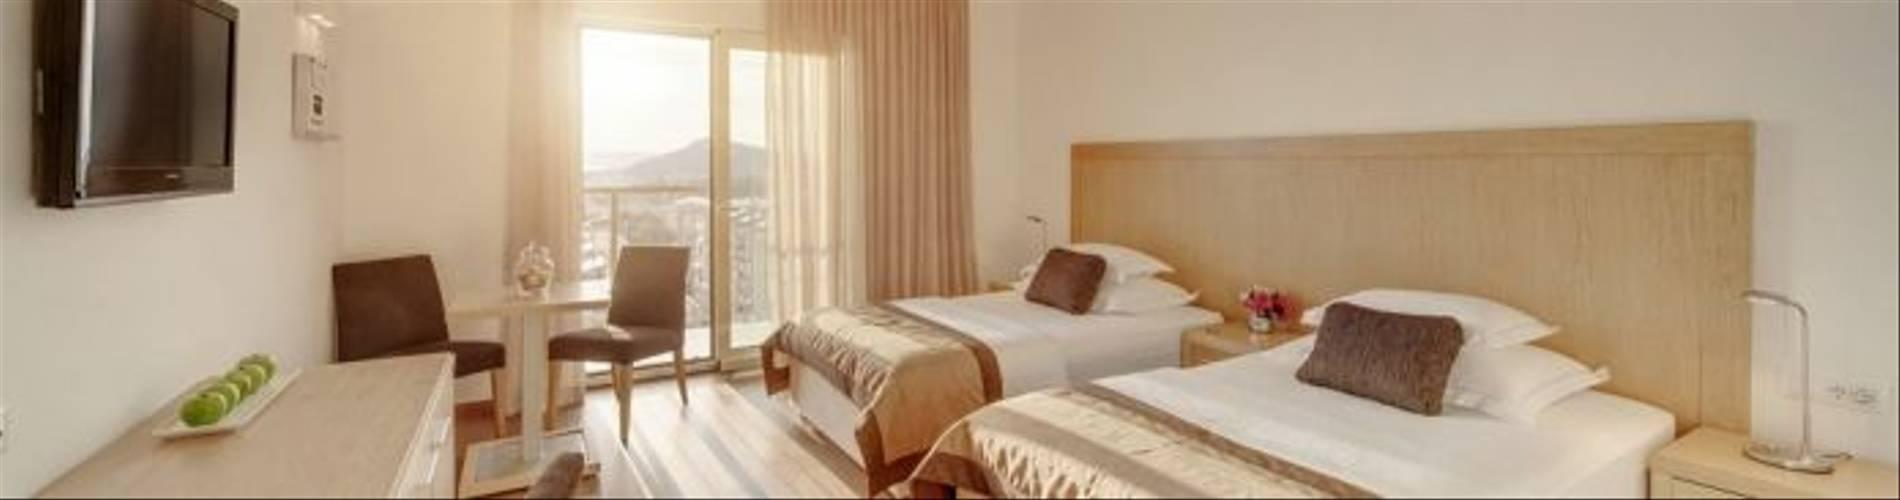 HotelResidence_DIOKLECIJAN_room-bedRoom-interier-panorama_2048px_5D3A2462-695x409.jpg